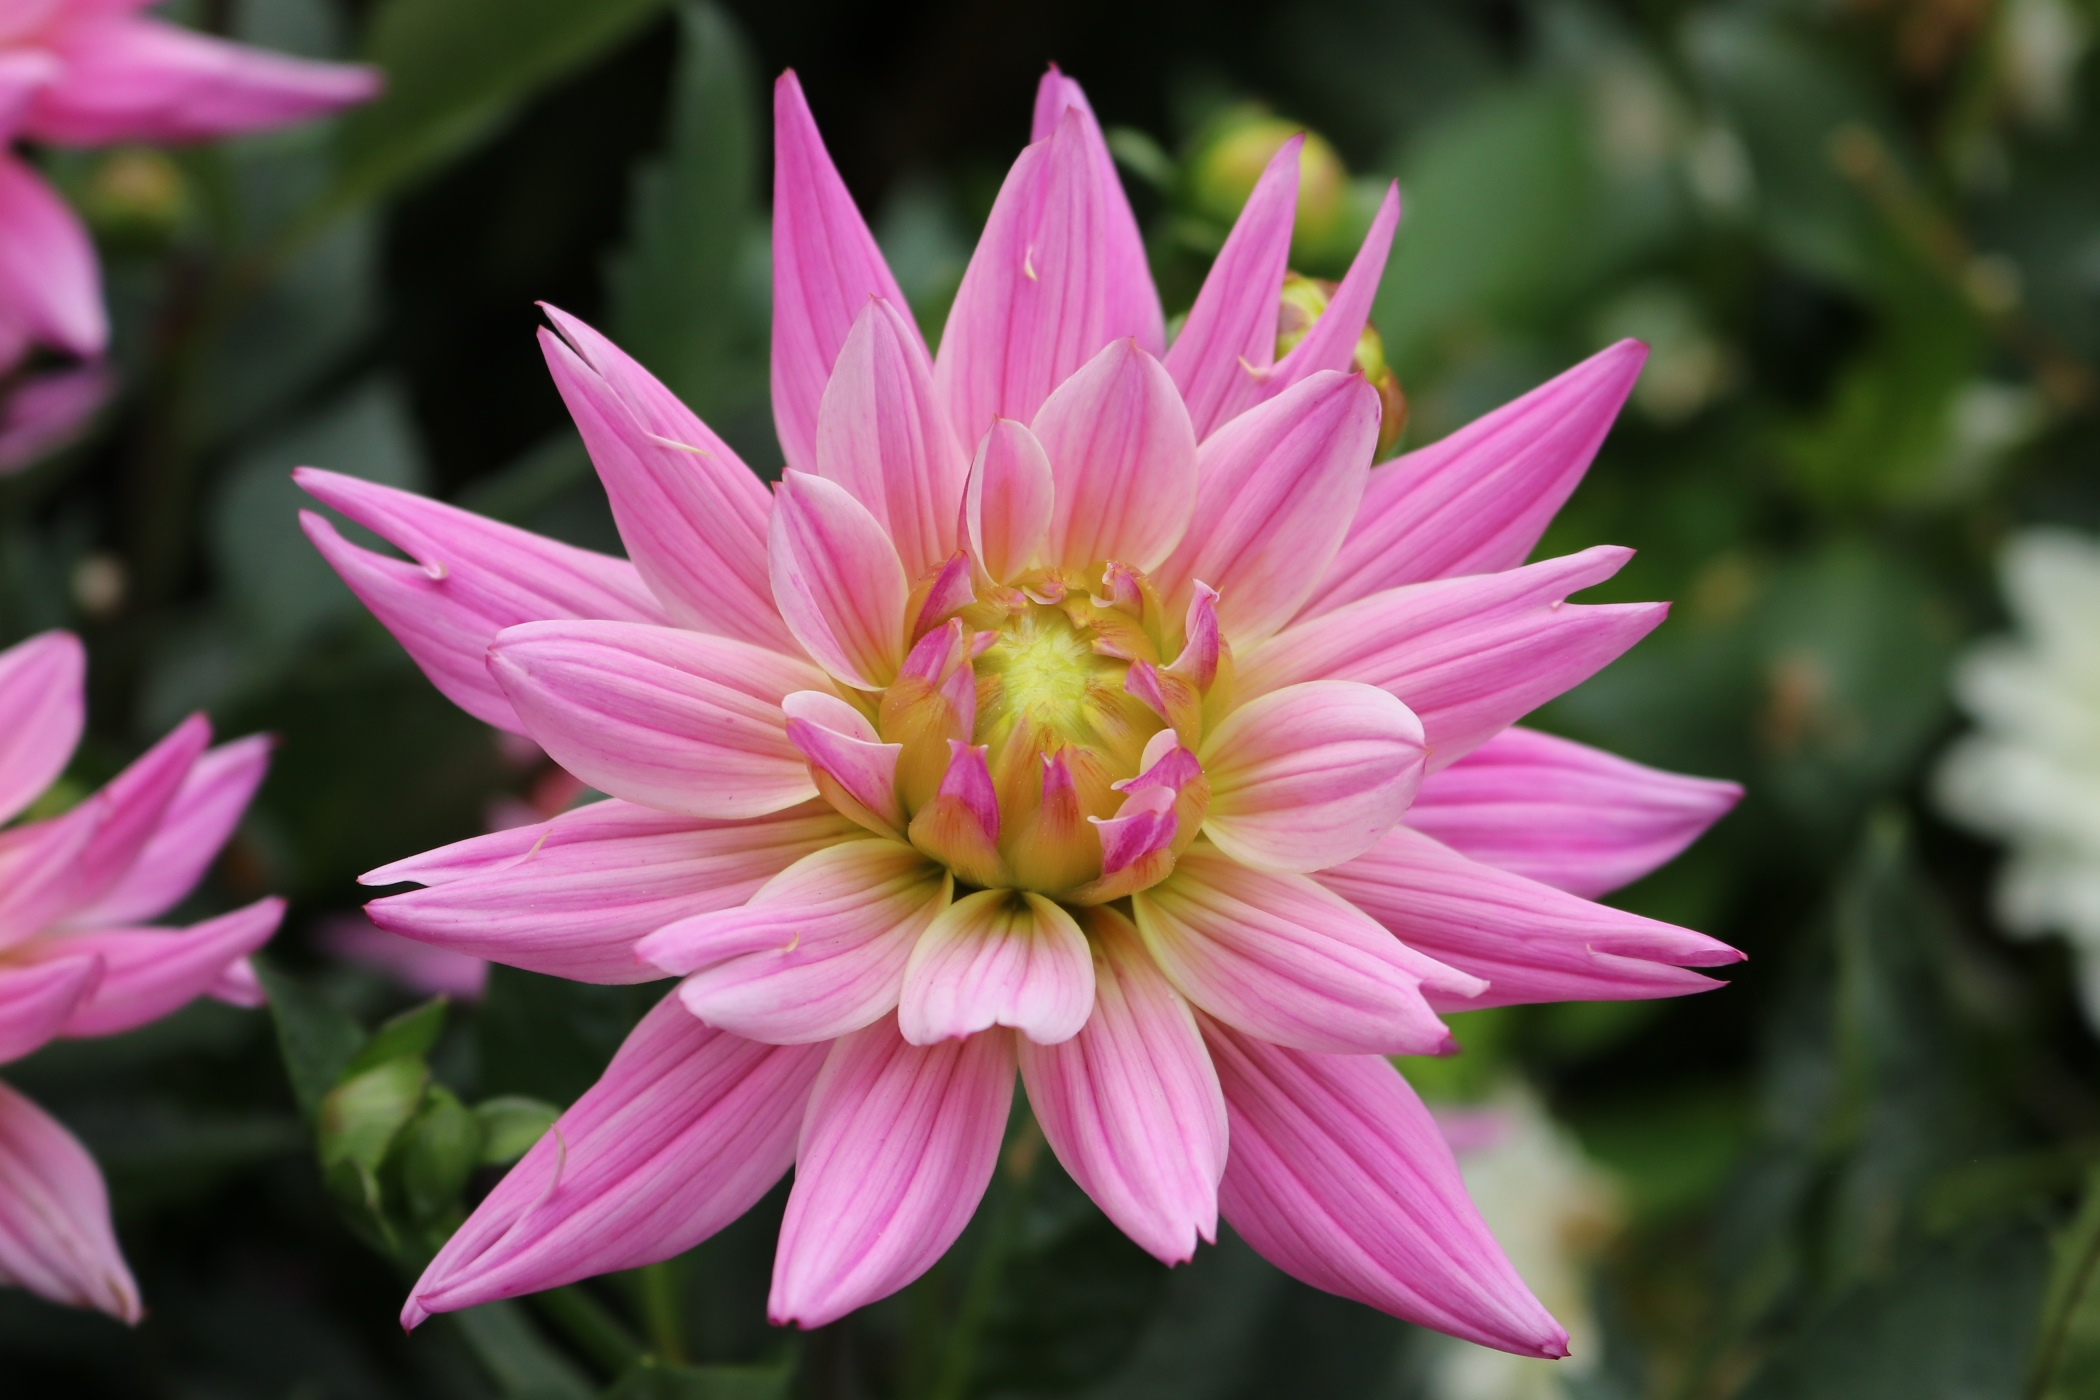 rosa gefärbte Dahlie